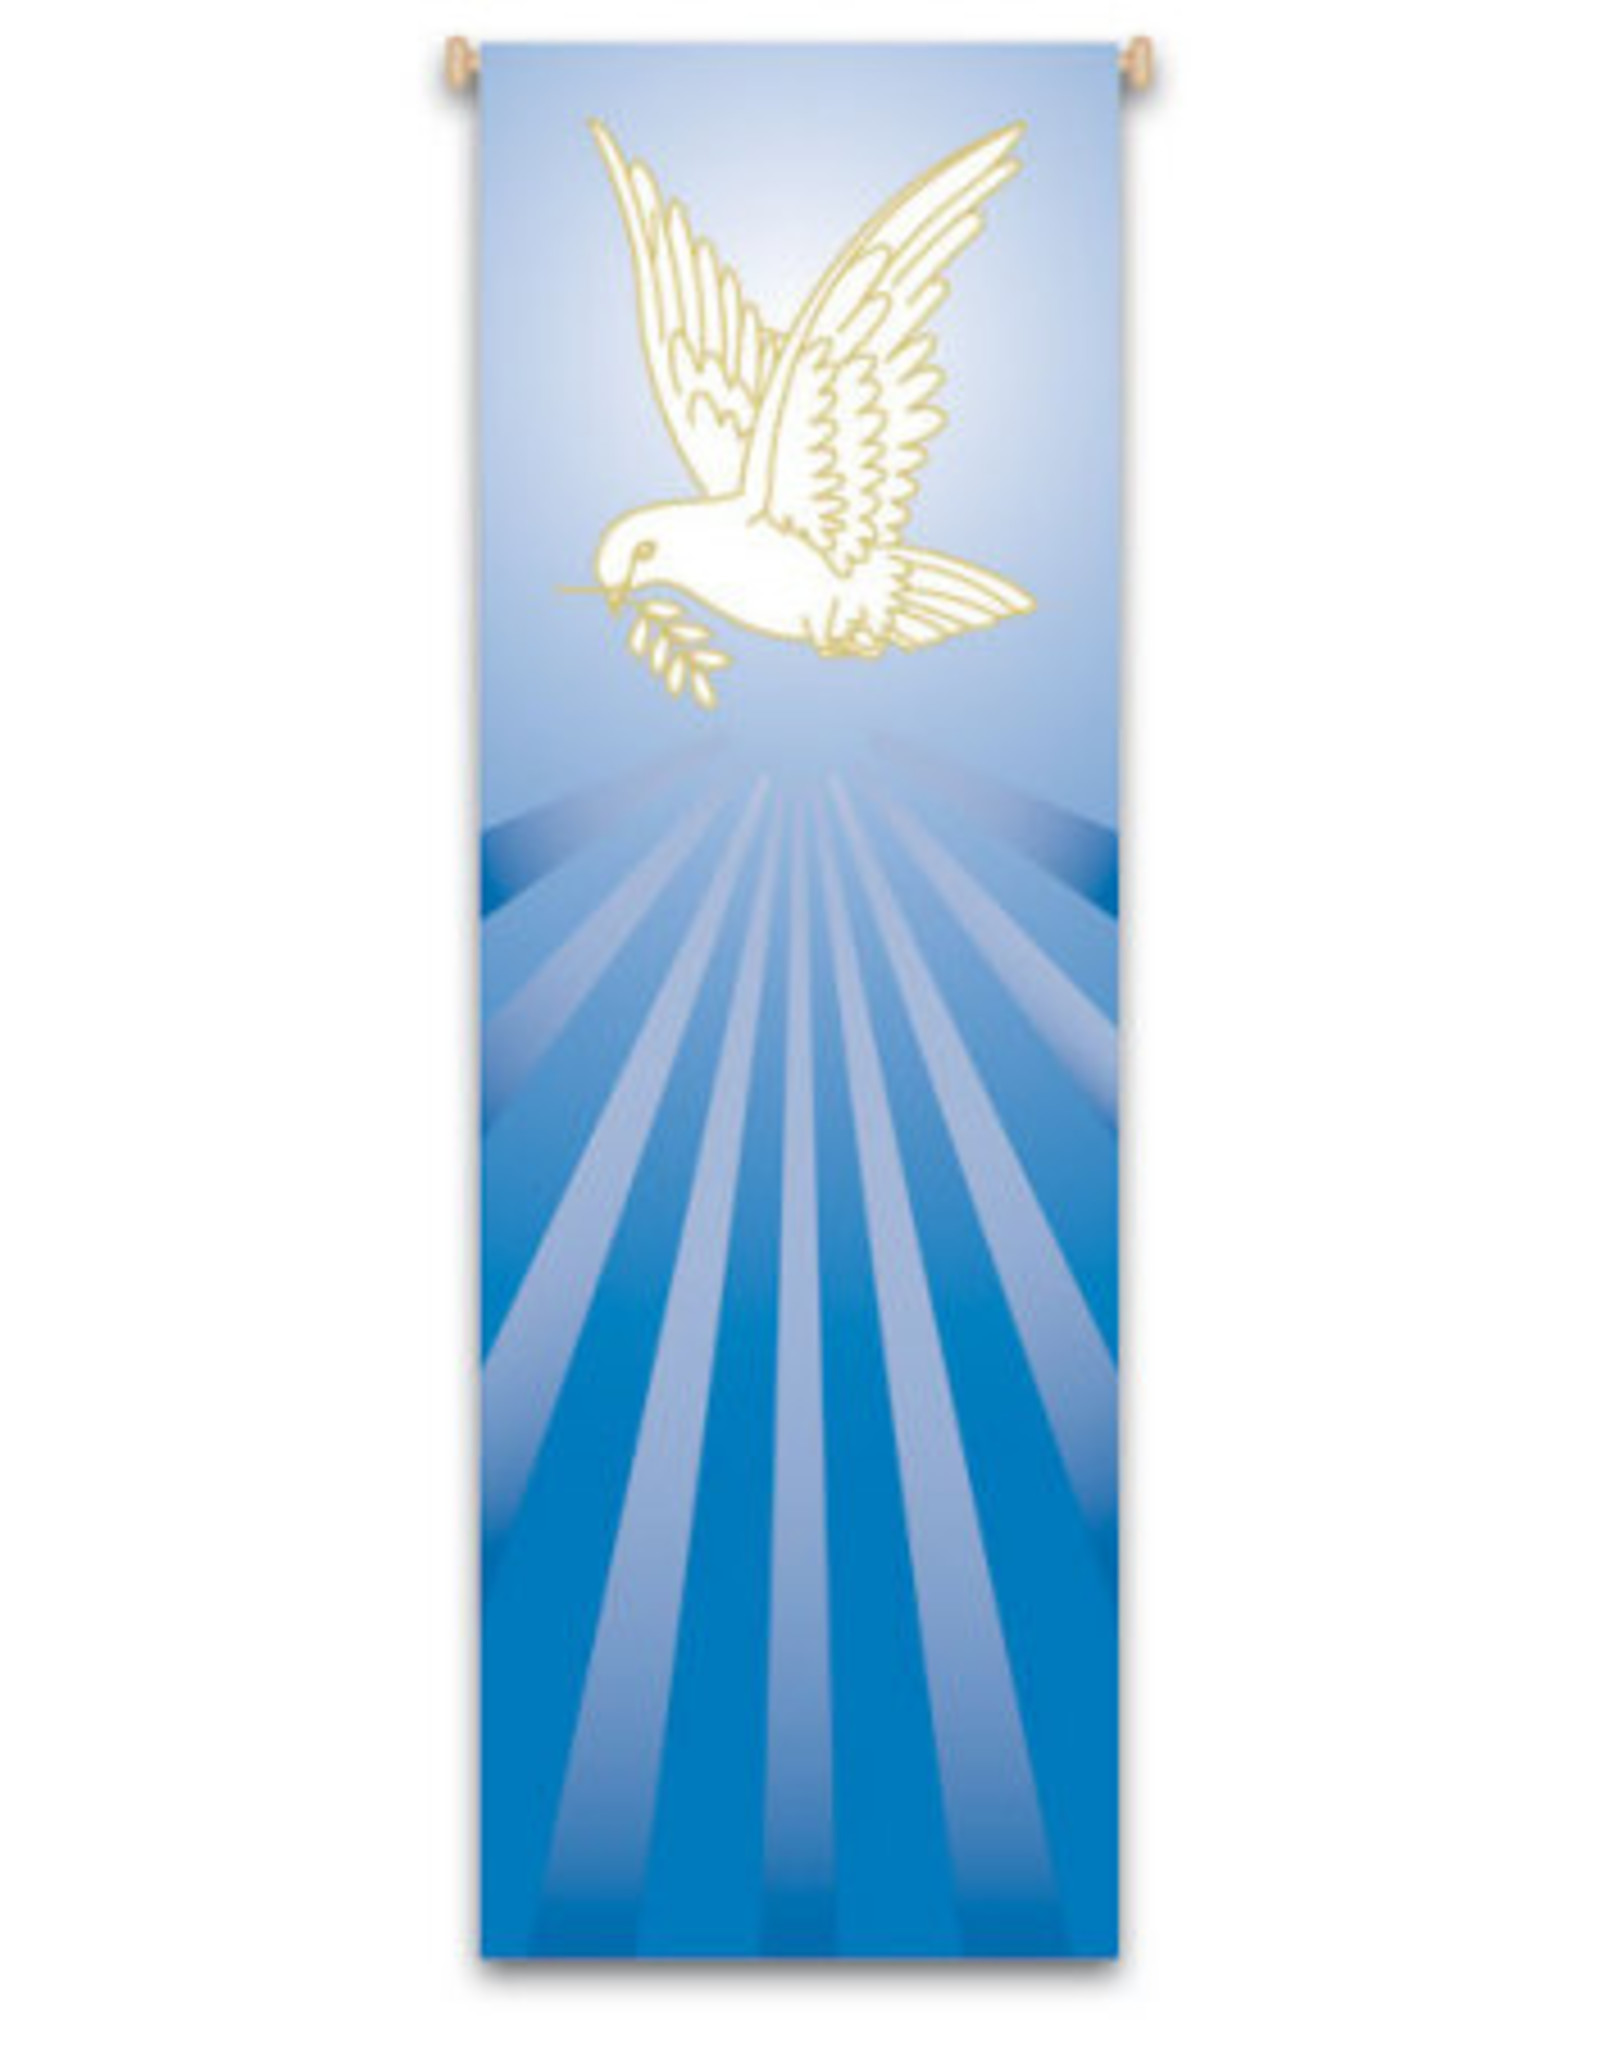 BANNER HOLY SPIRIT 9-7/8X3-1/4